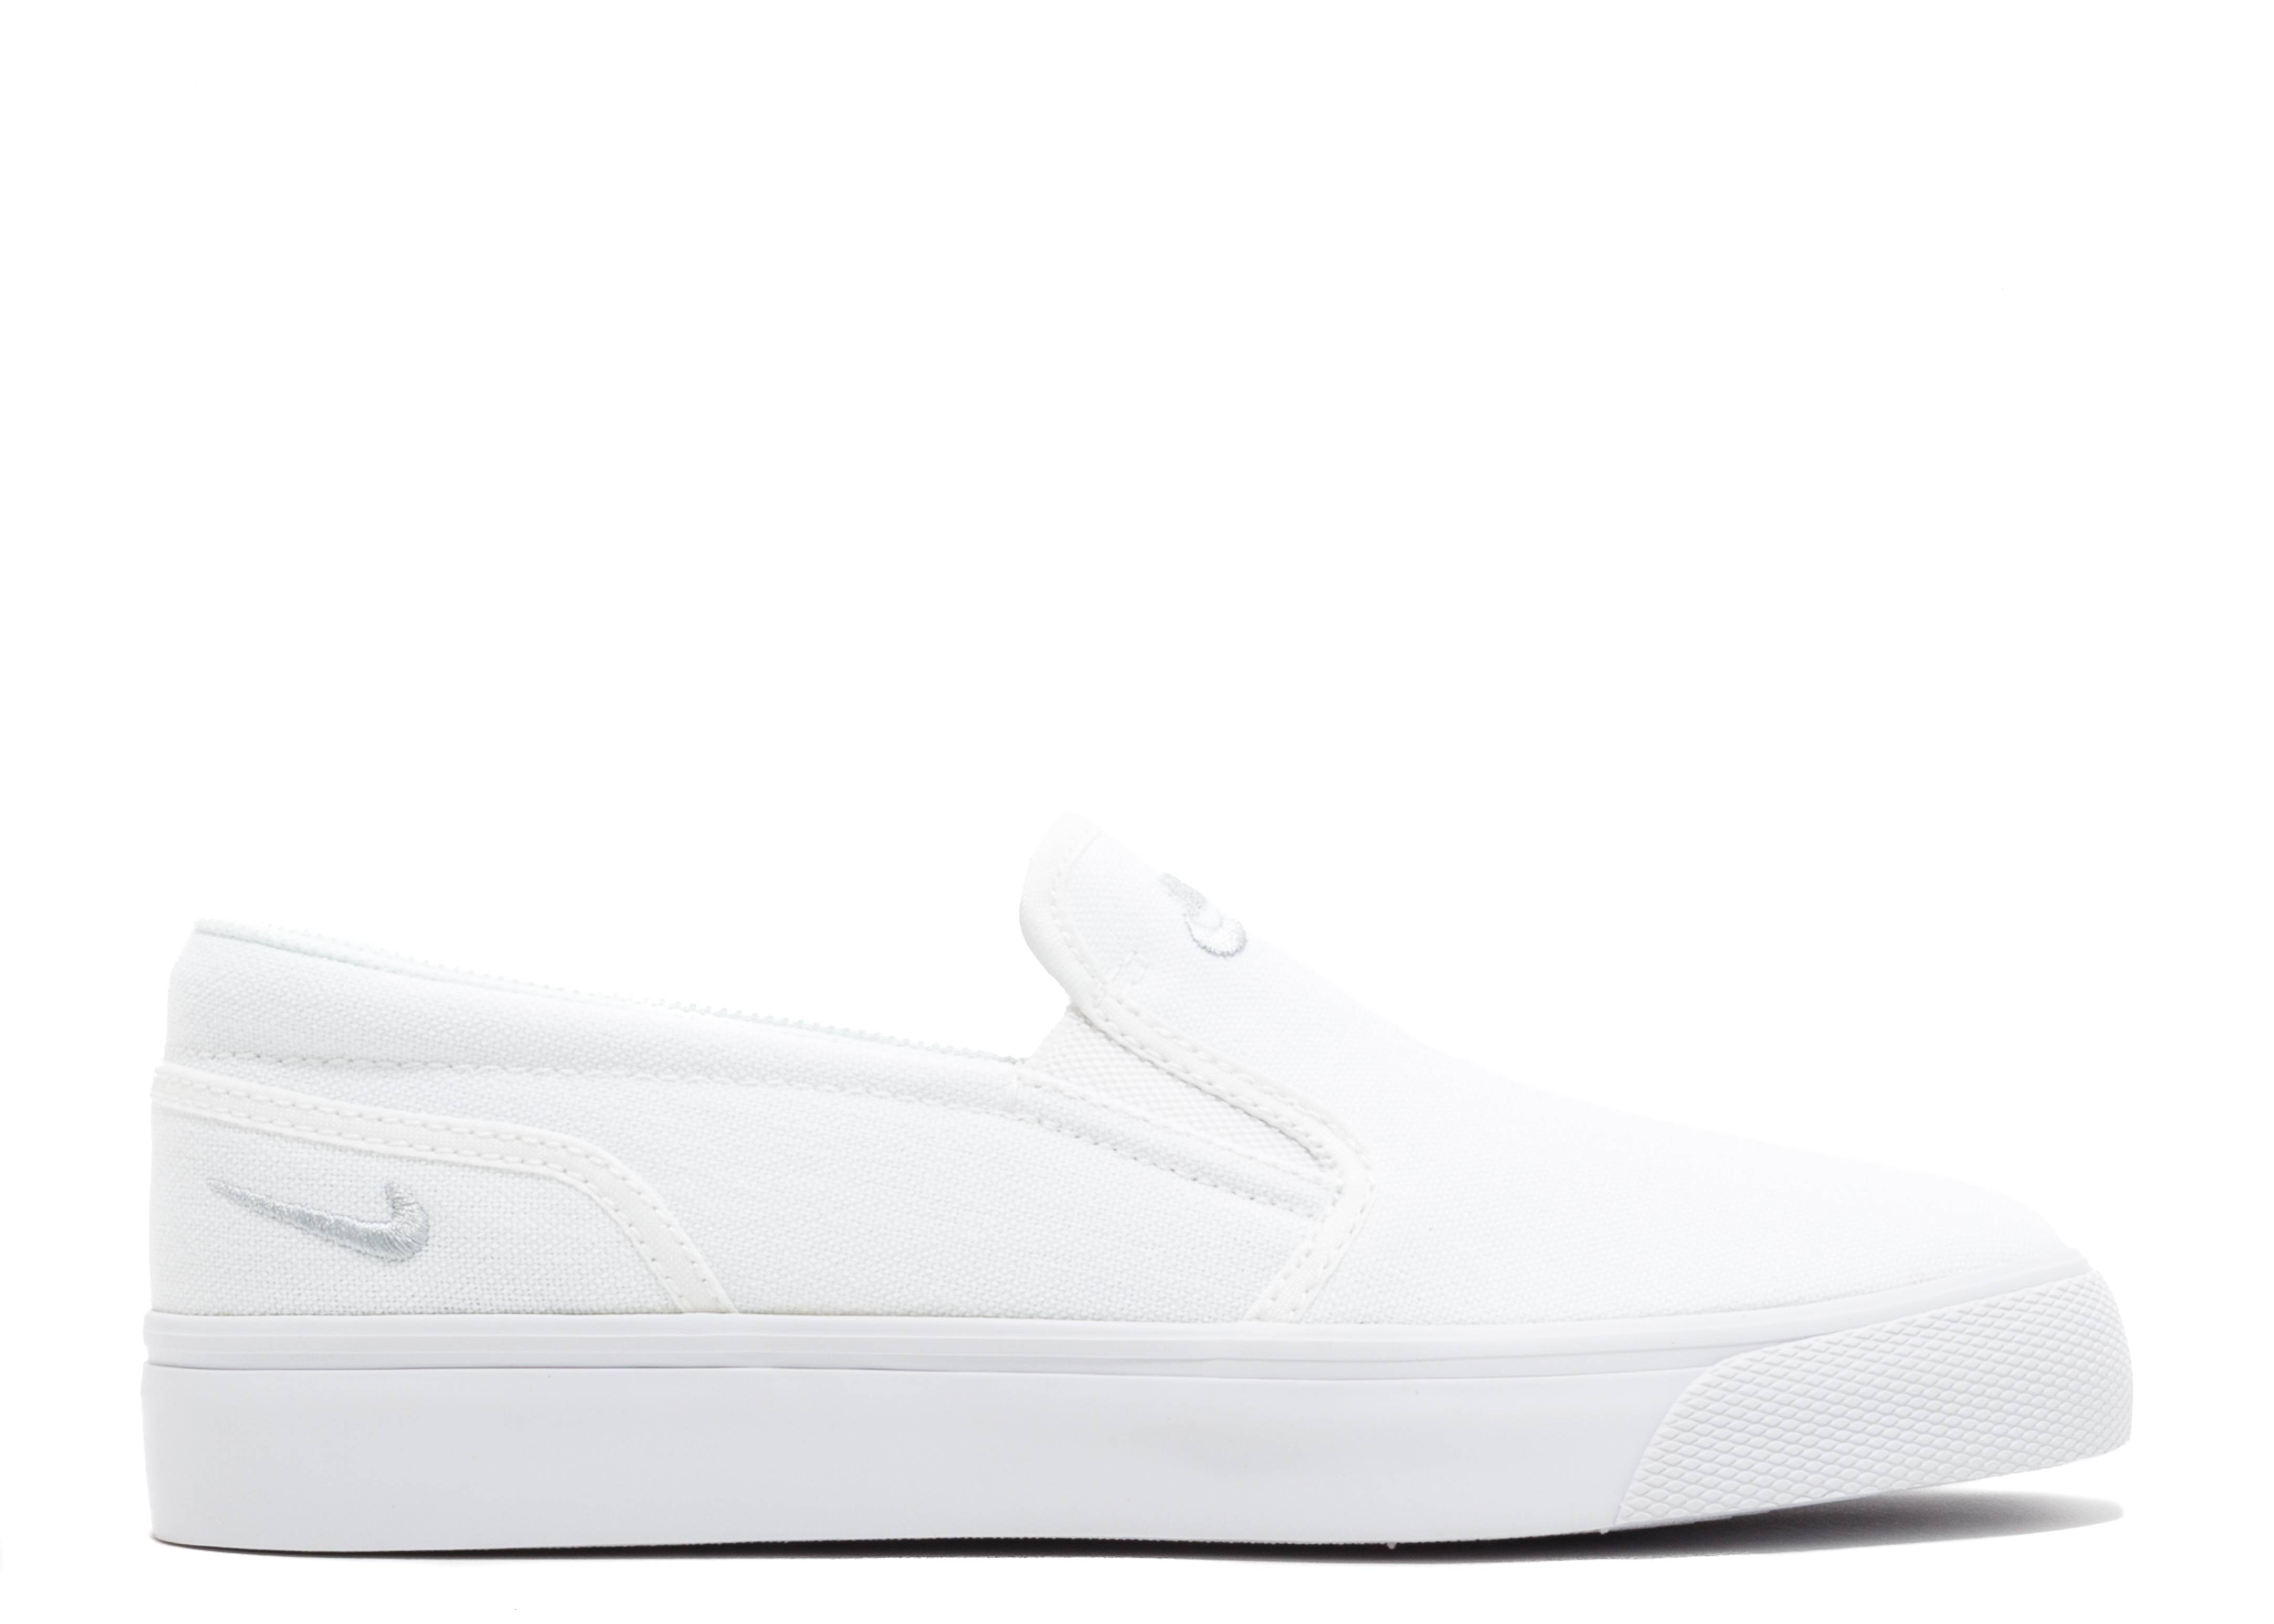 cf9febacda97 WMNS TOKI SLIP CANVAS - Nike - 724770 100 - white white